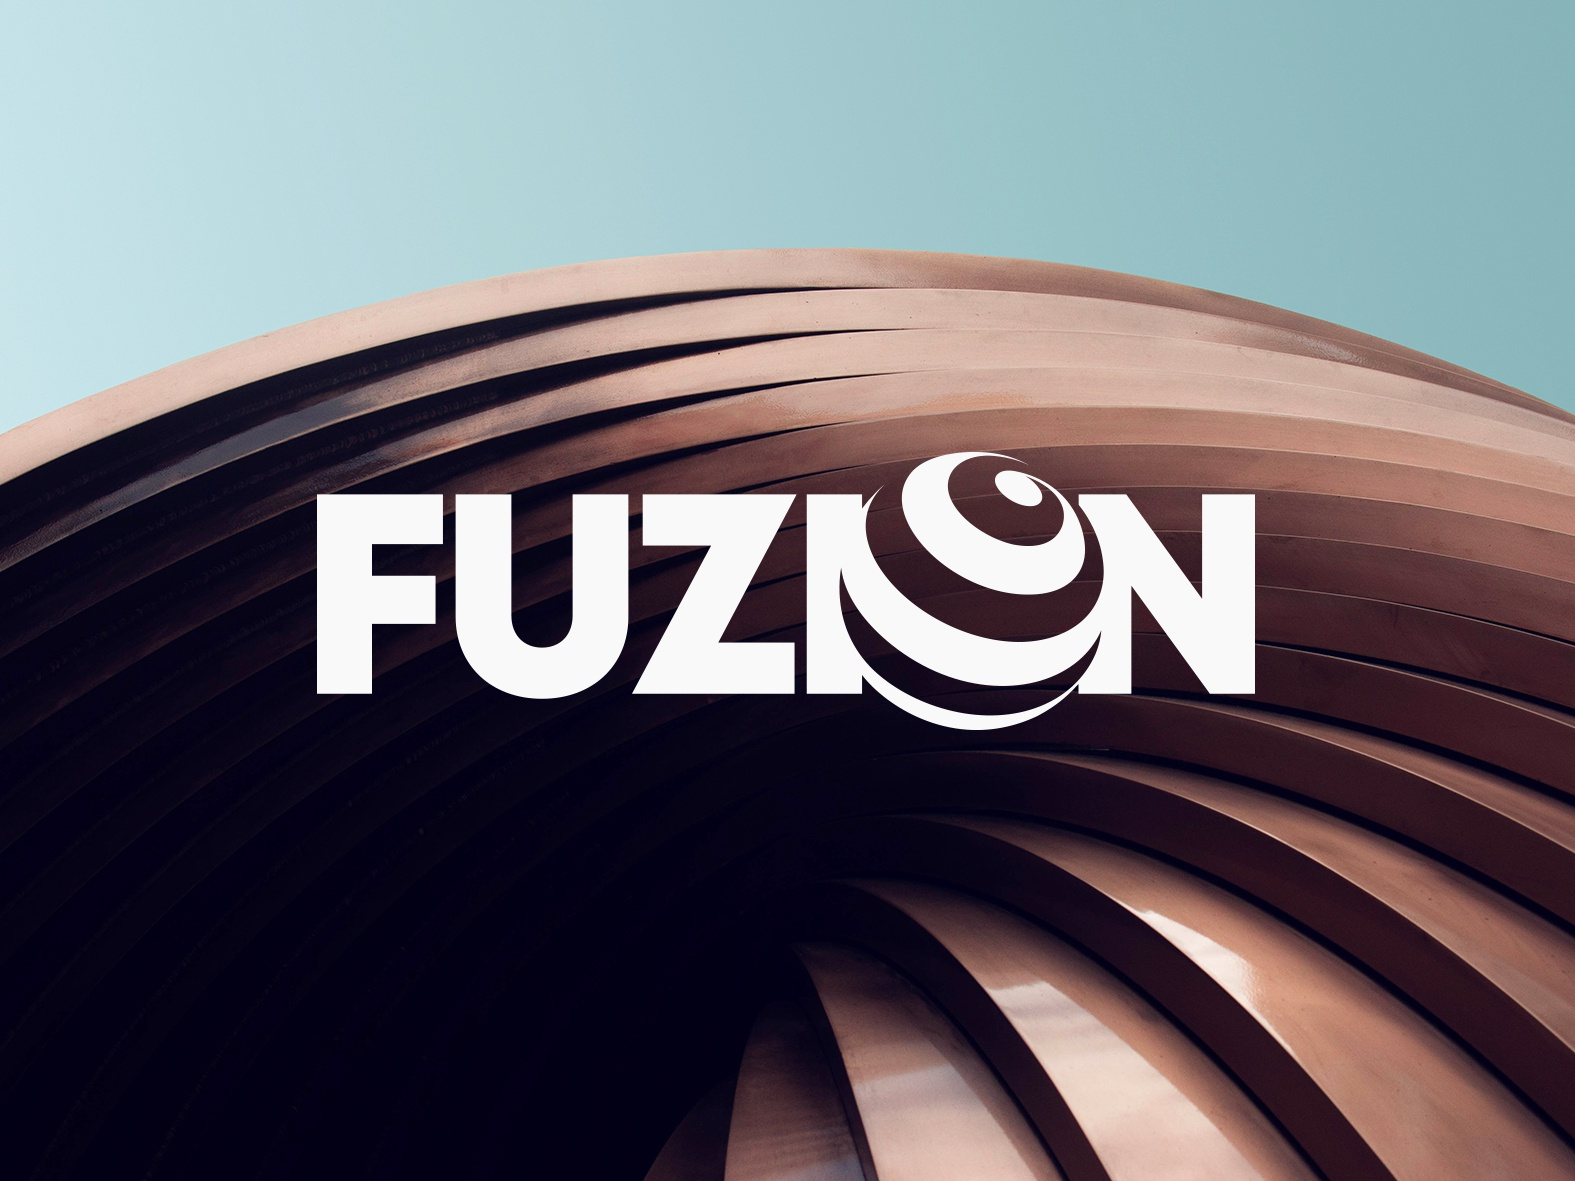 Fuzion Logo Design business logo designer brand branding identity type typography typeface circle round black graphic graphics design wordmark lettermark logotype logo designer best top 3d globe animation